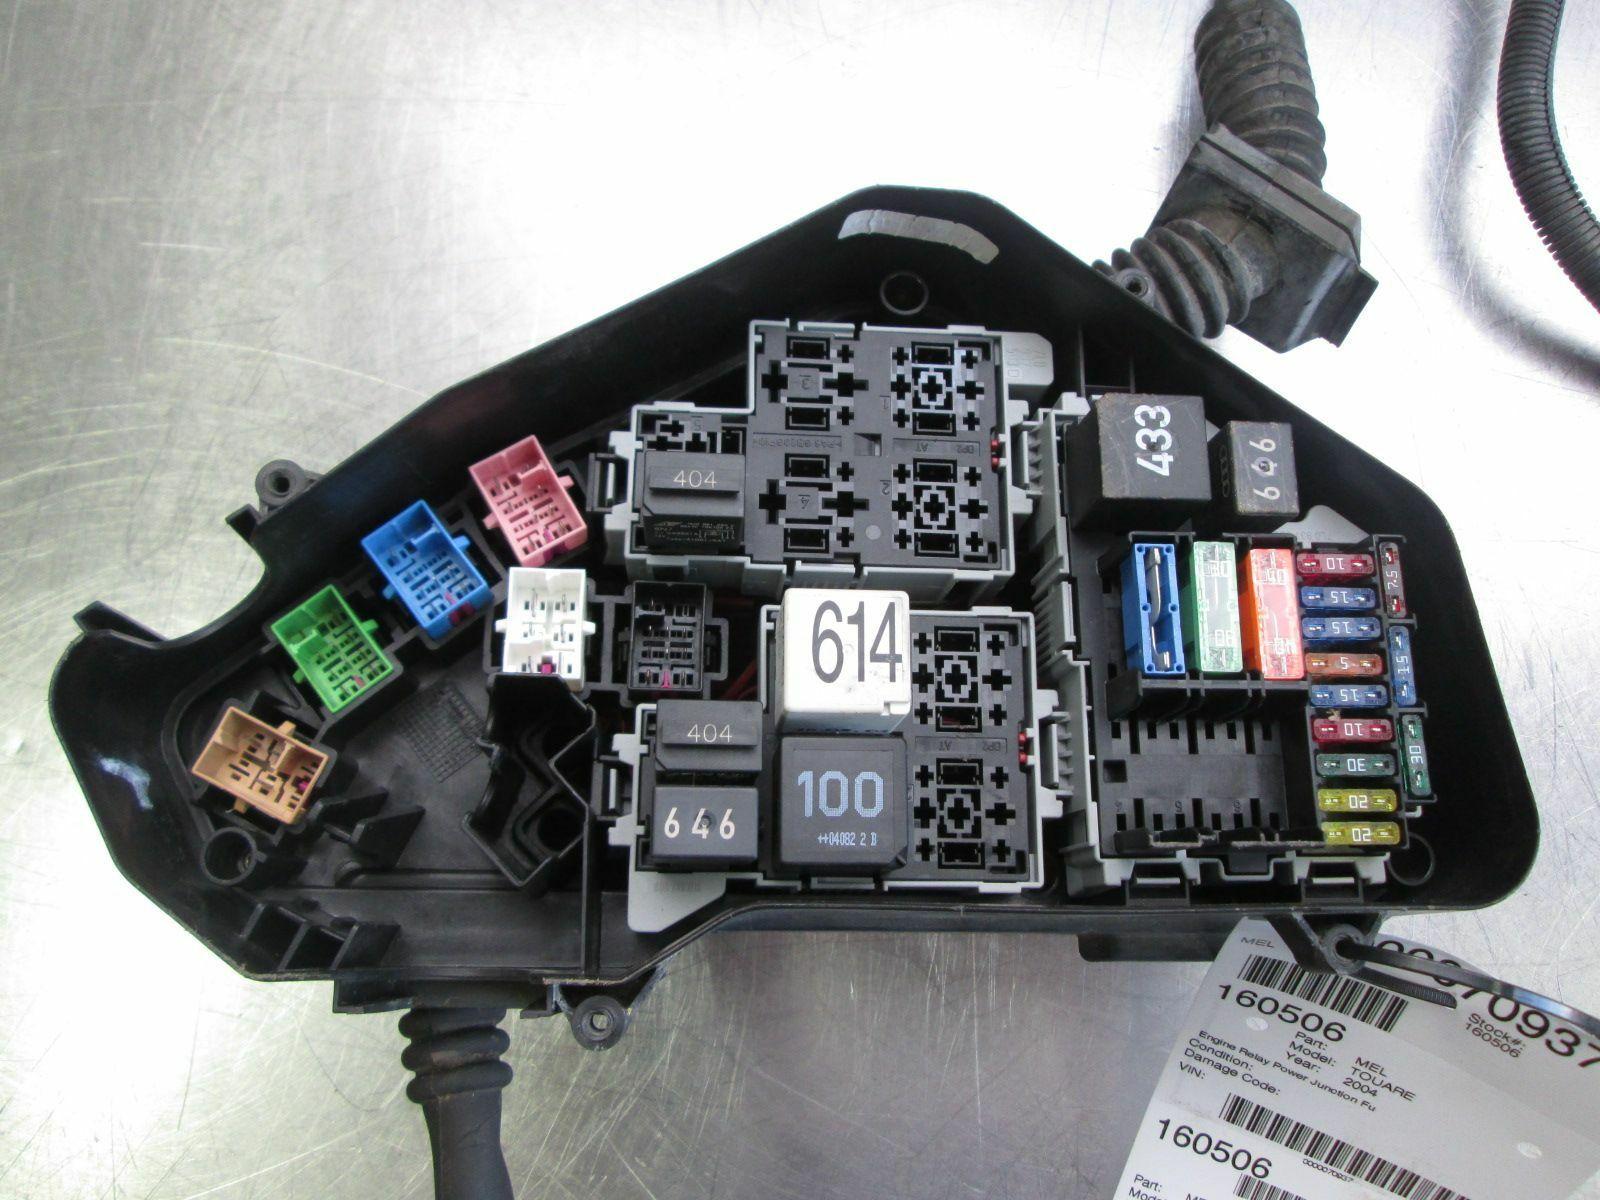 2004 touareg fuse box engine relay power junction    fuse       box    4 2l v8 7p0907295b  engine relay power junction    fuse       box    4 2l v8 7p0907295b